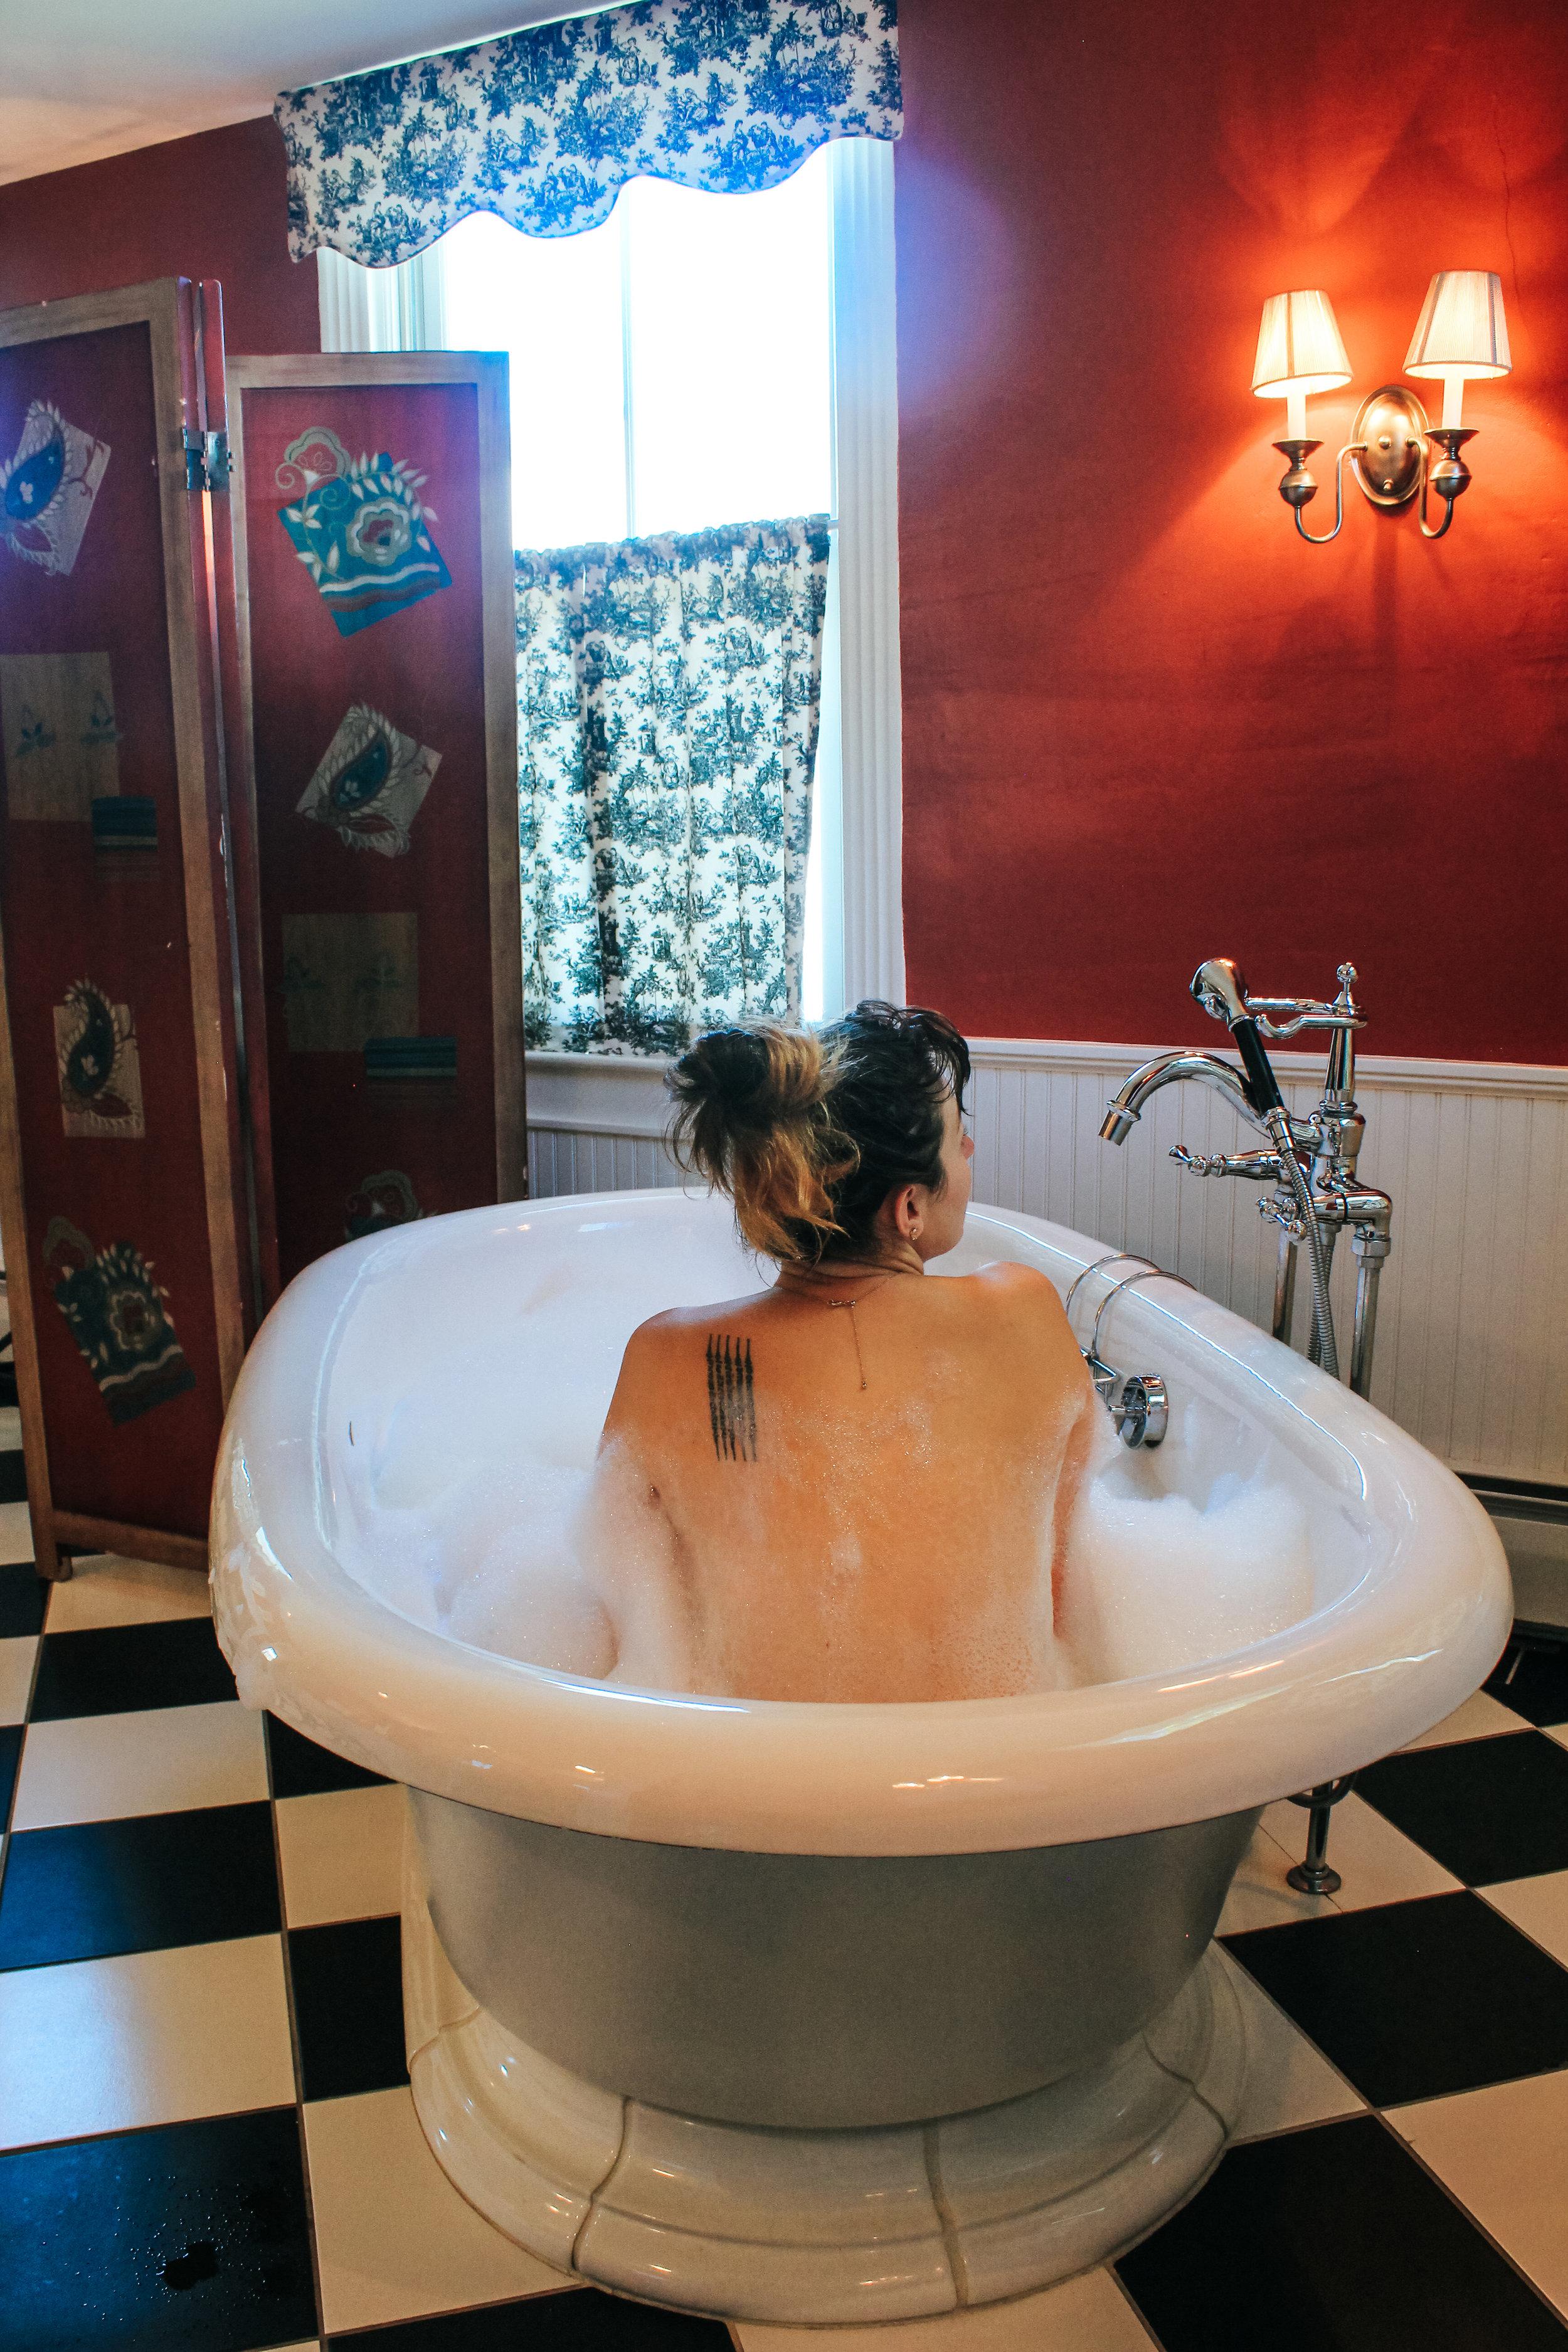 Luxurious Soaker Tub at the Four Columns Inn, Newfane, Vermont